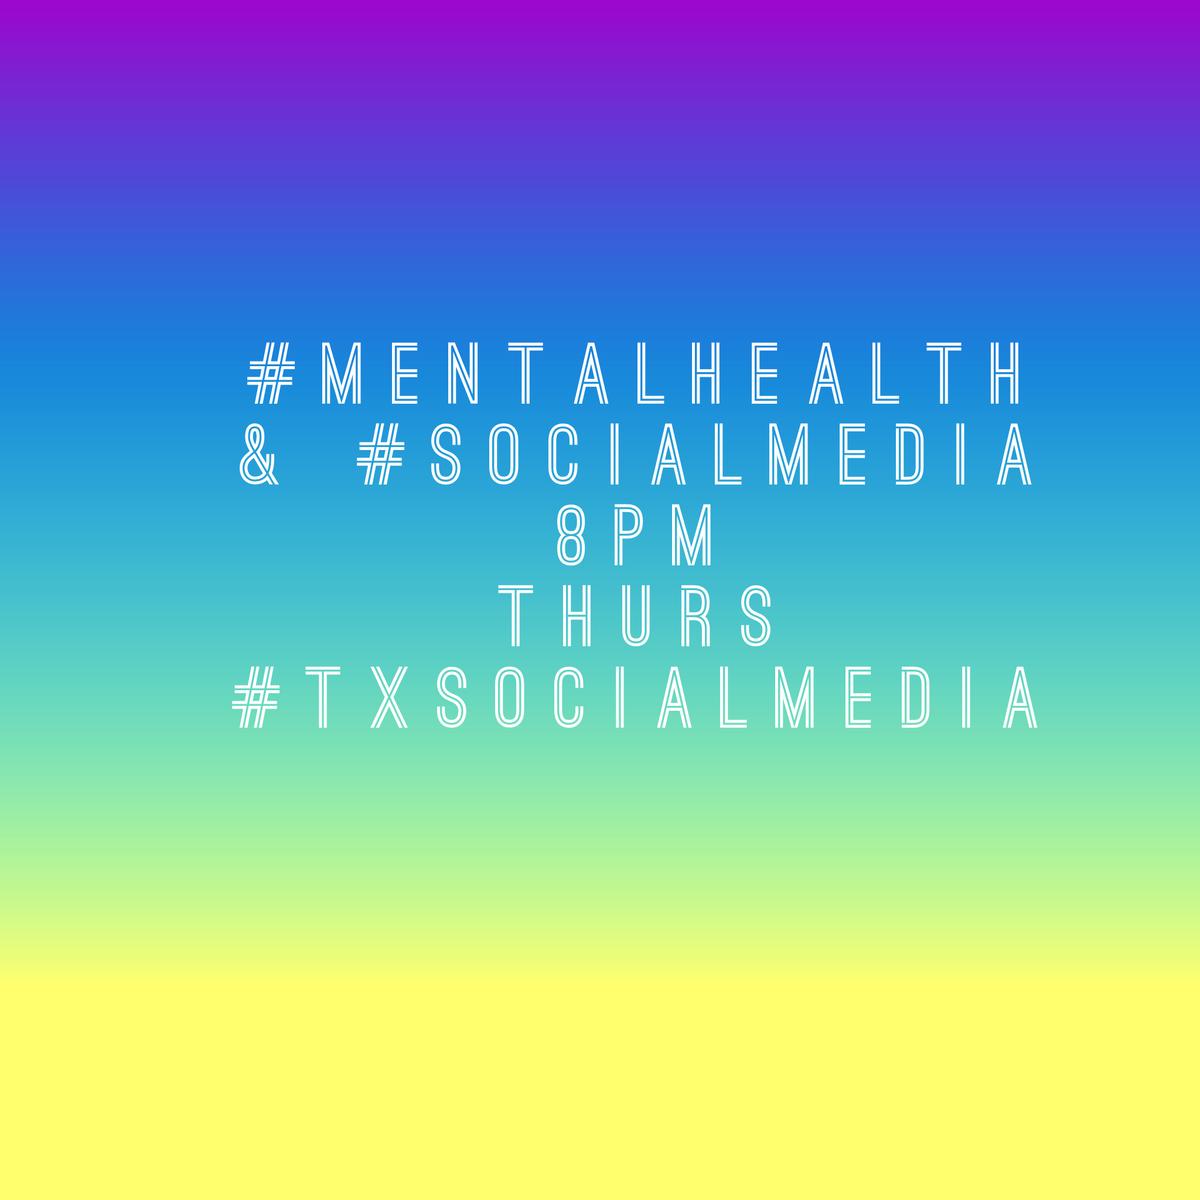 Thumbnail for #mentalhealth & social media